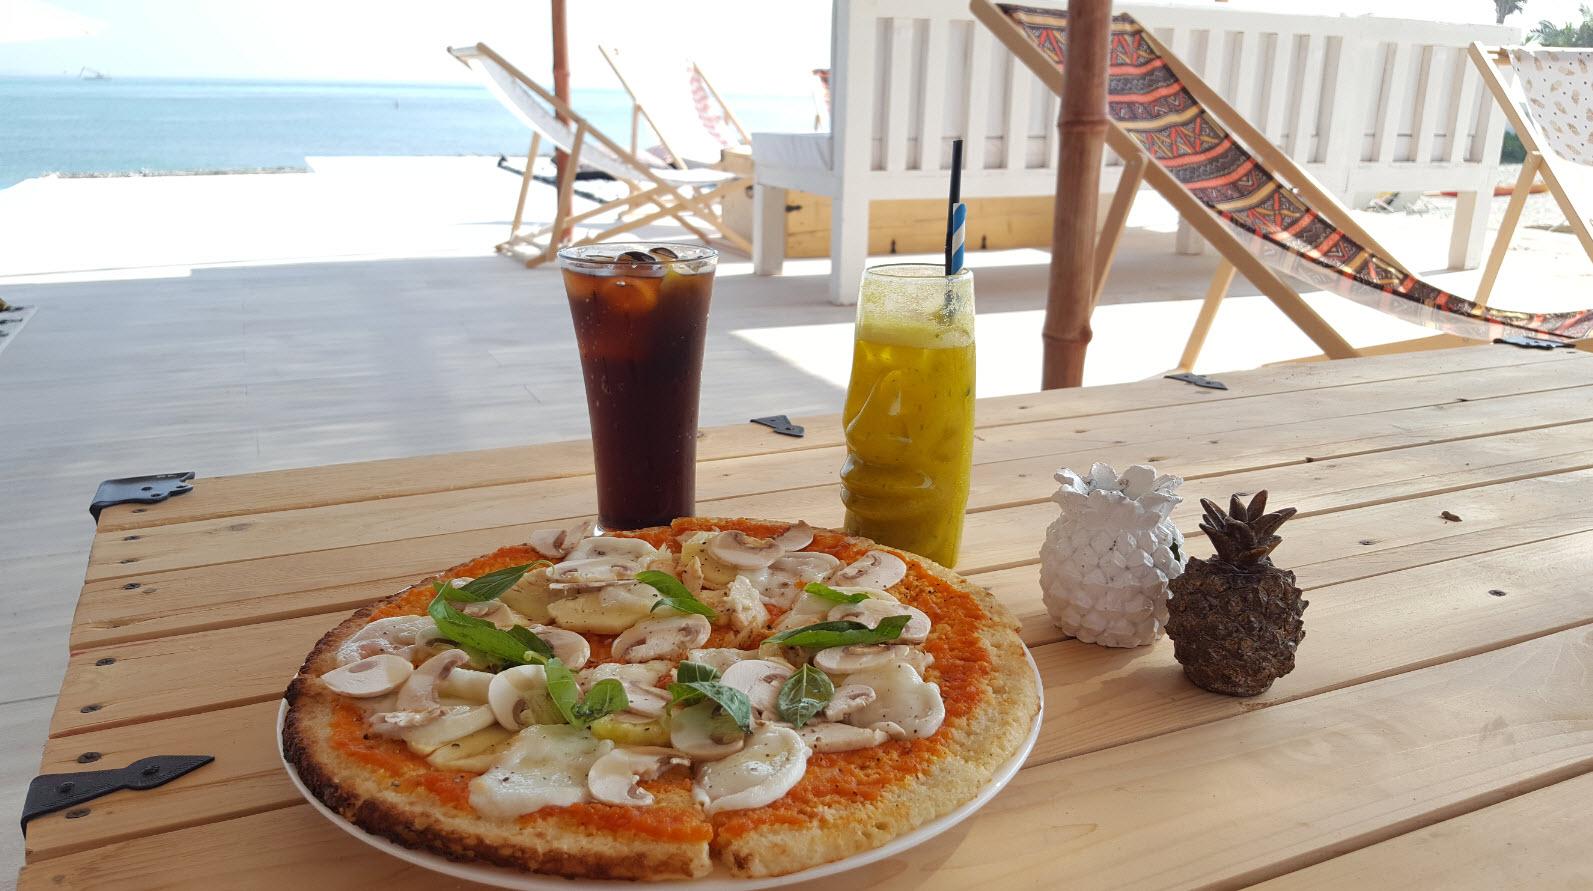 Pizza sans gluten a l'ananas